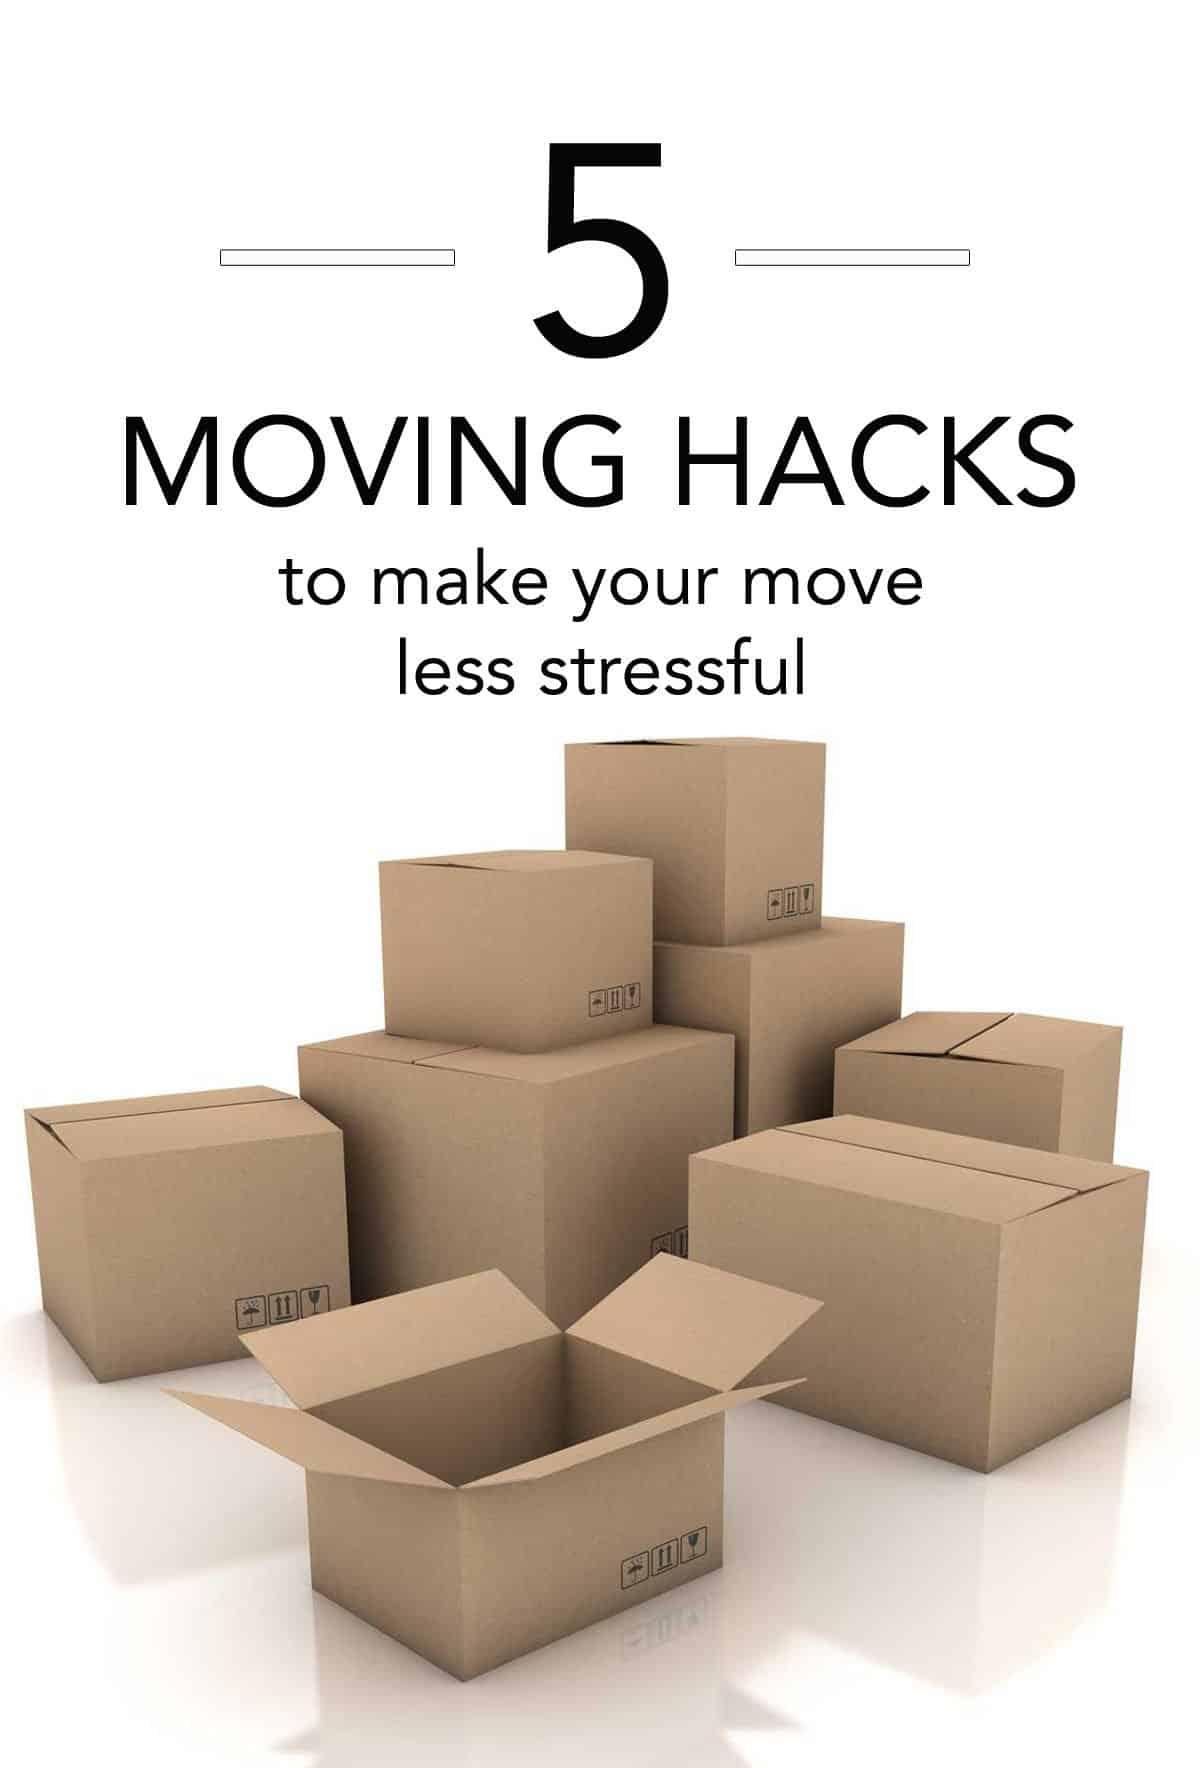 Moving-hacks.jpg